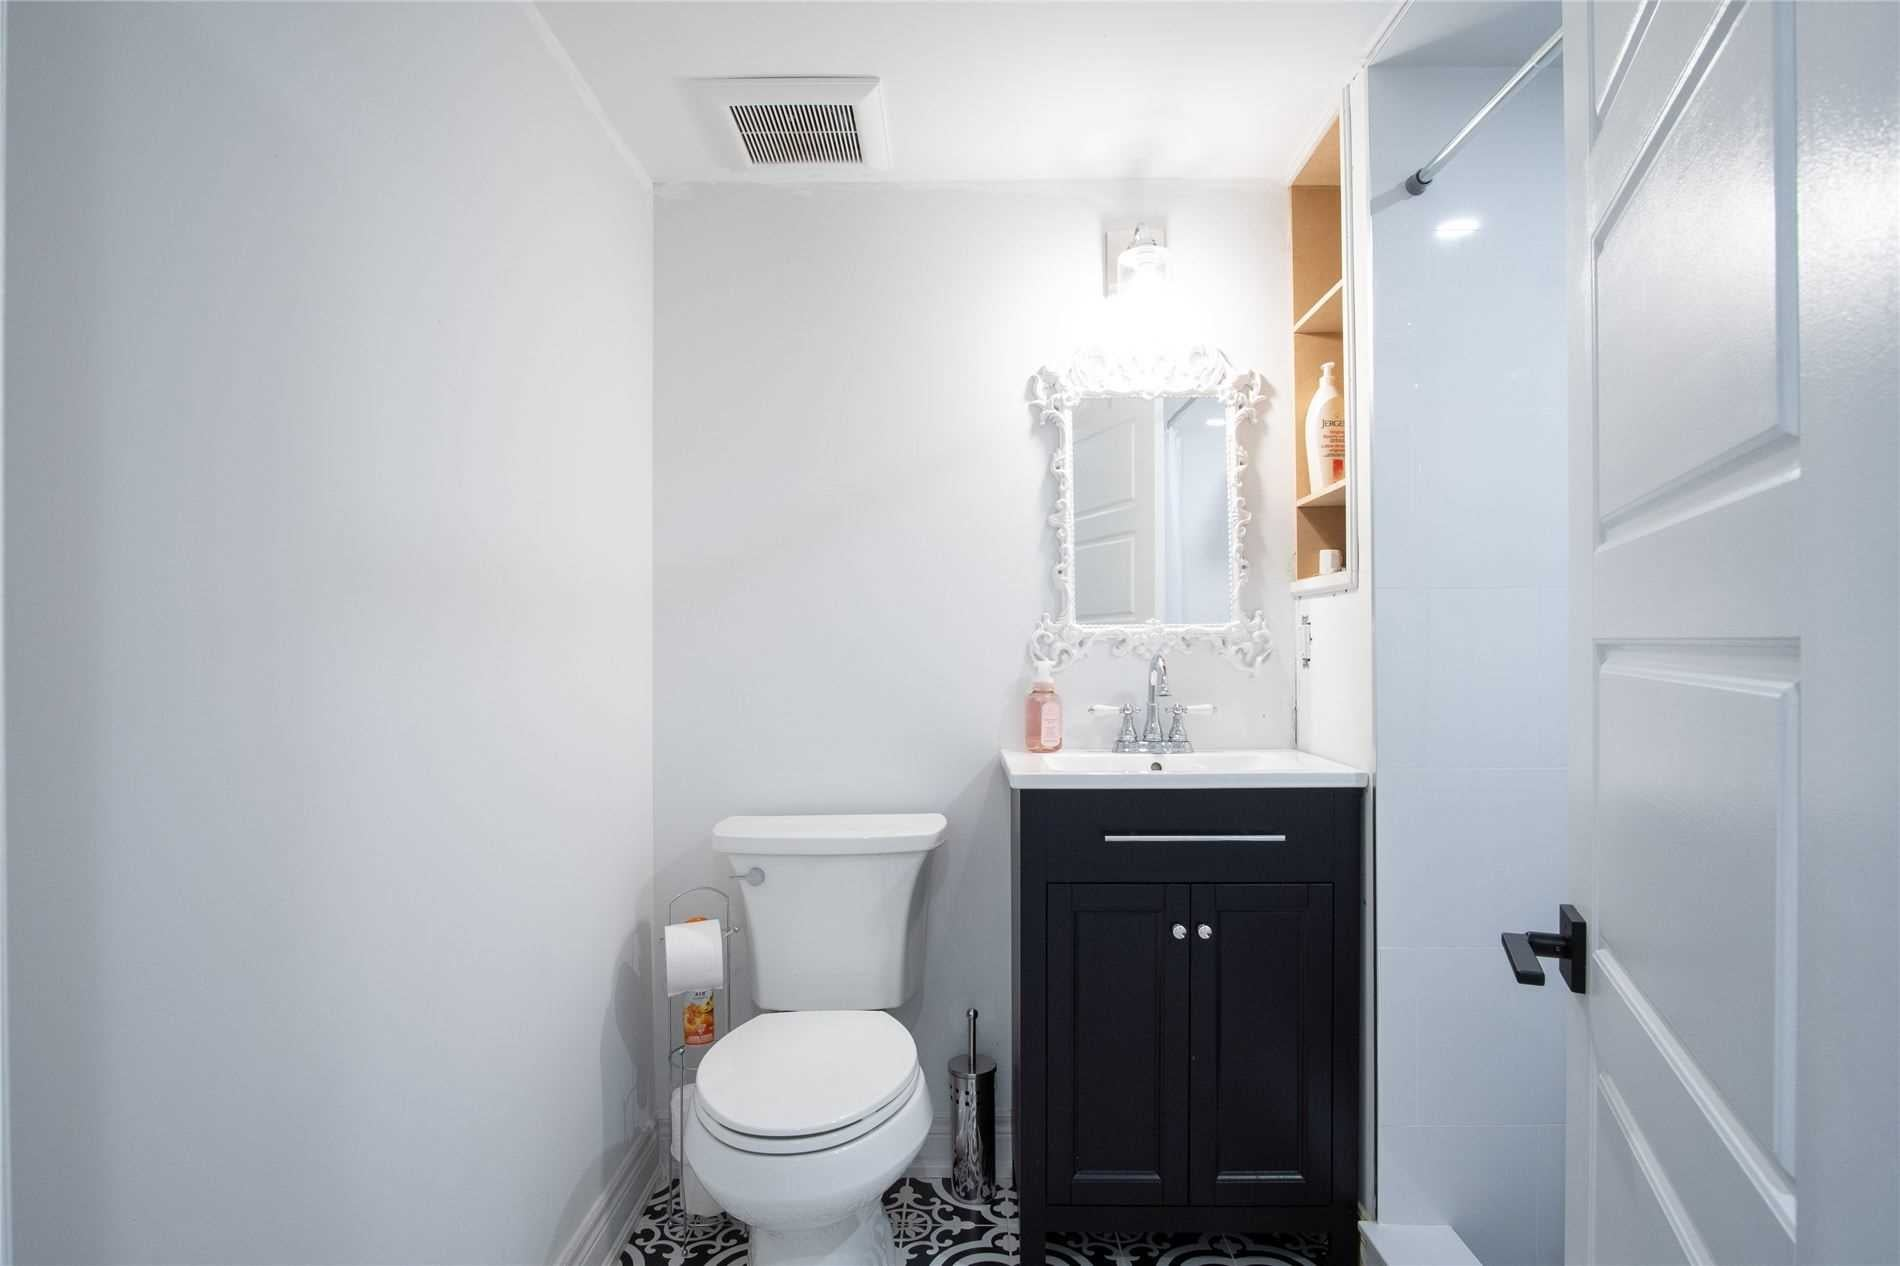 827 Biggar Hts - Coates Detached for sale, 4 Bedrooms (W5400280) - #24